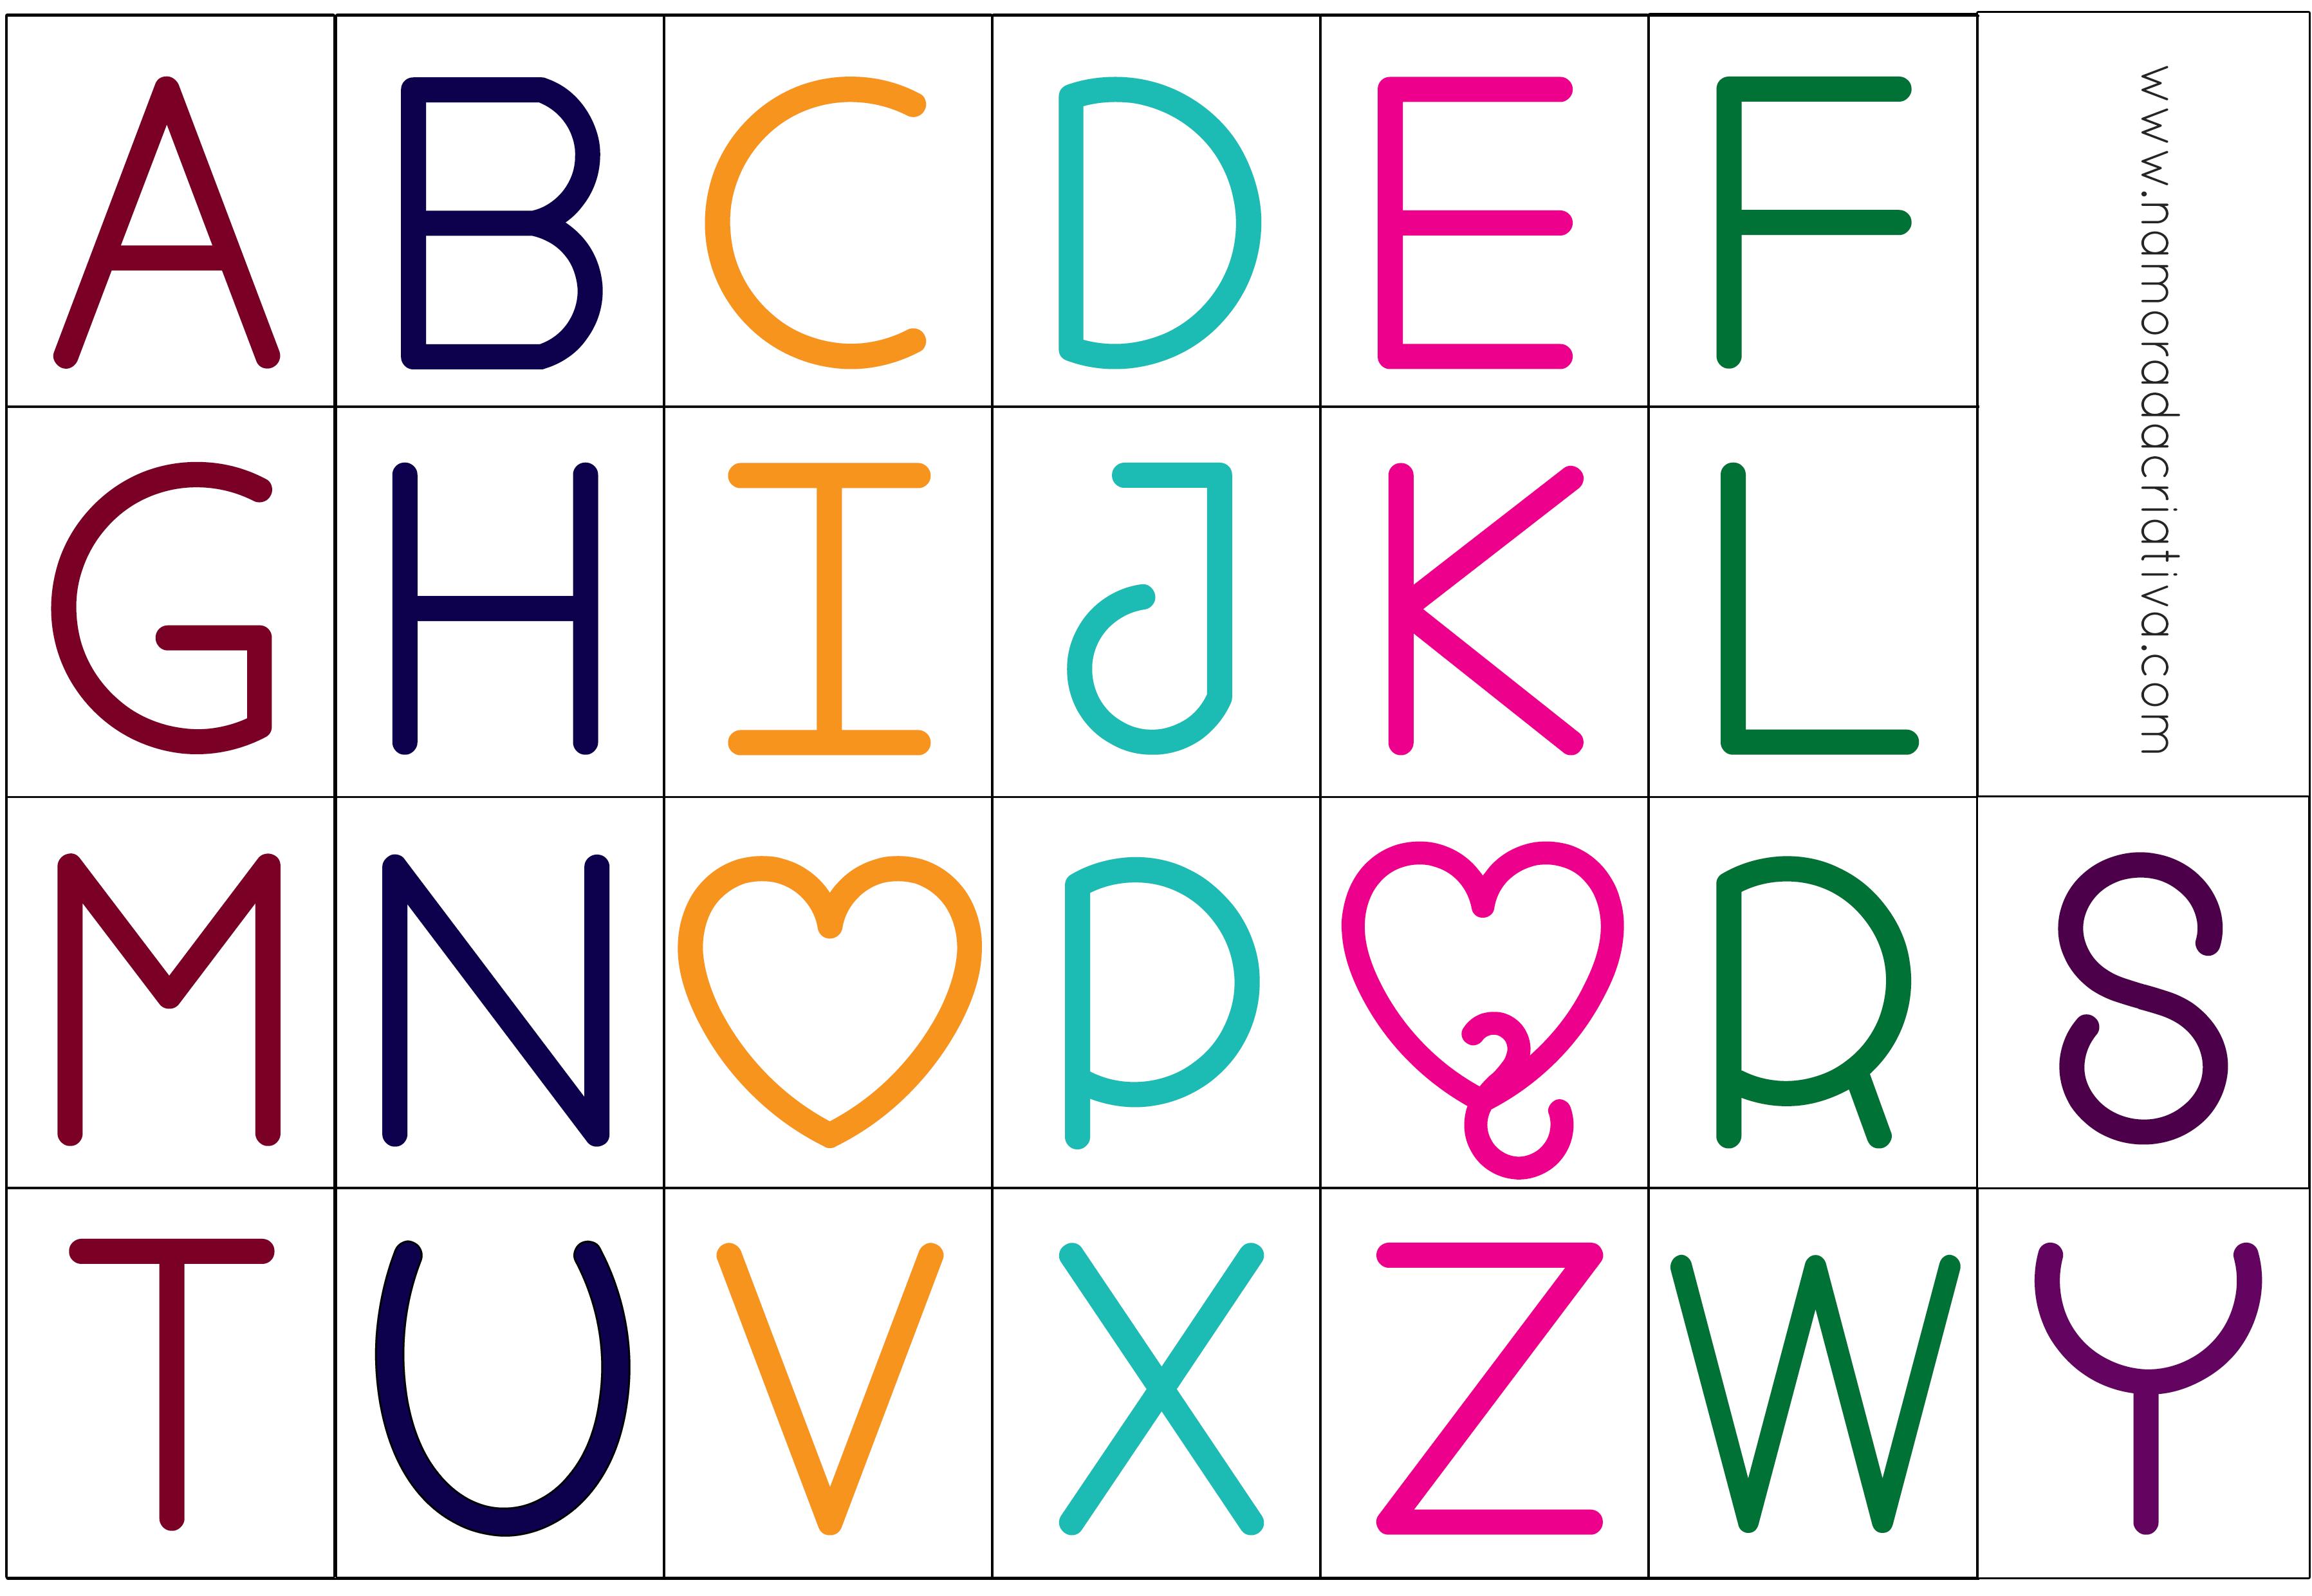 alfabeto_colorido